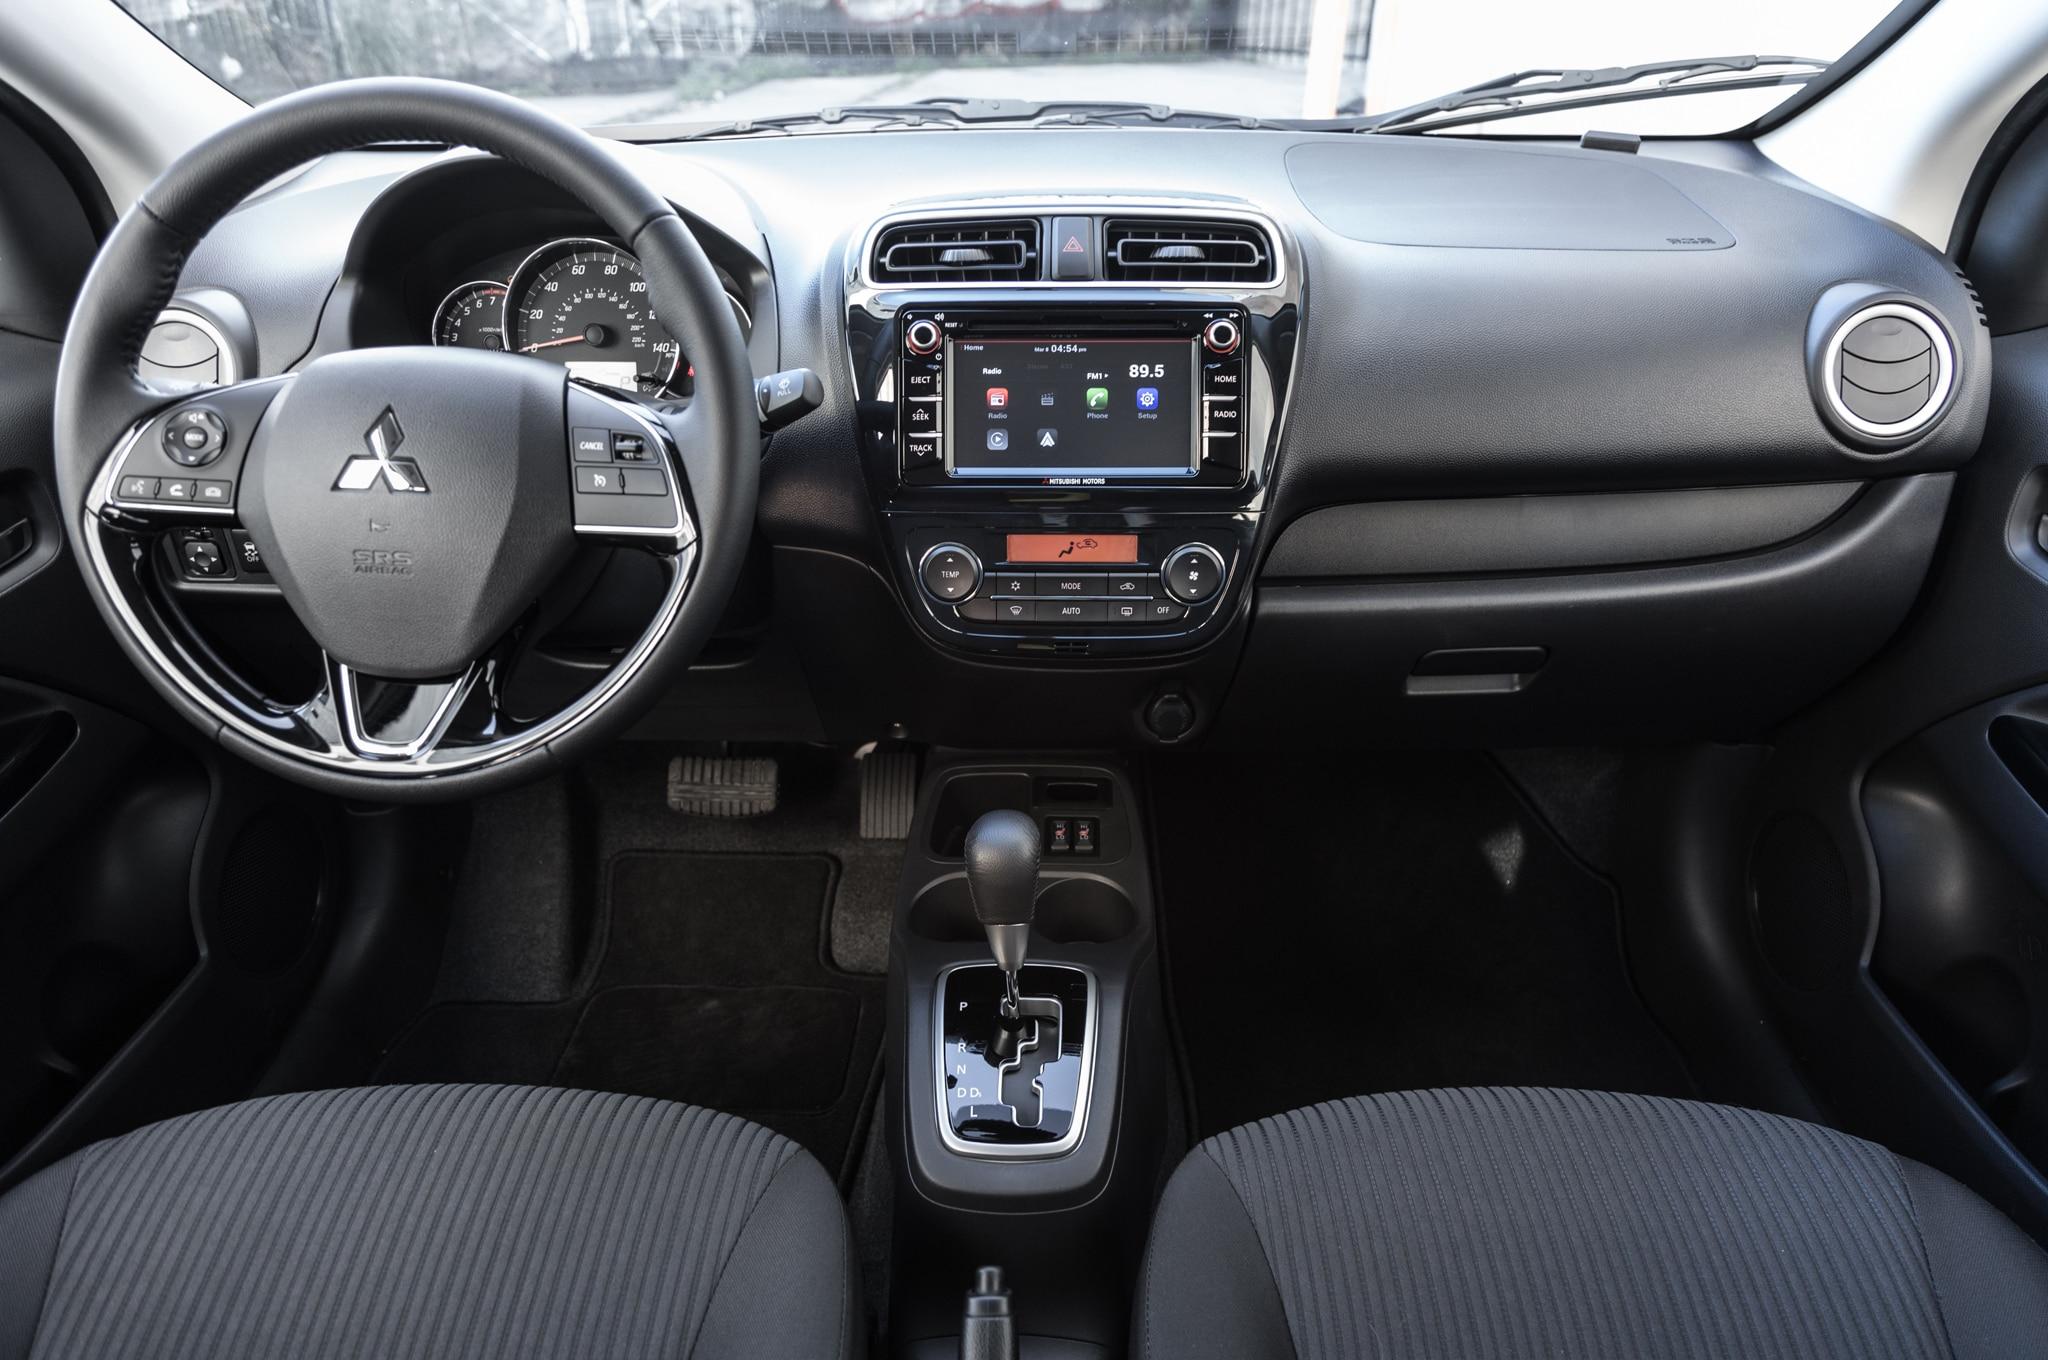 2017 Mitsubishi Mirage G4 Sedan Debuts In New York